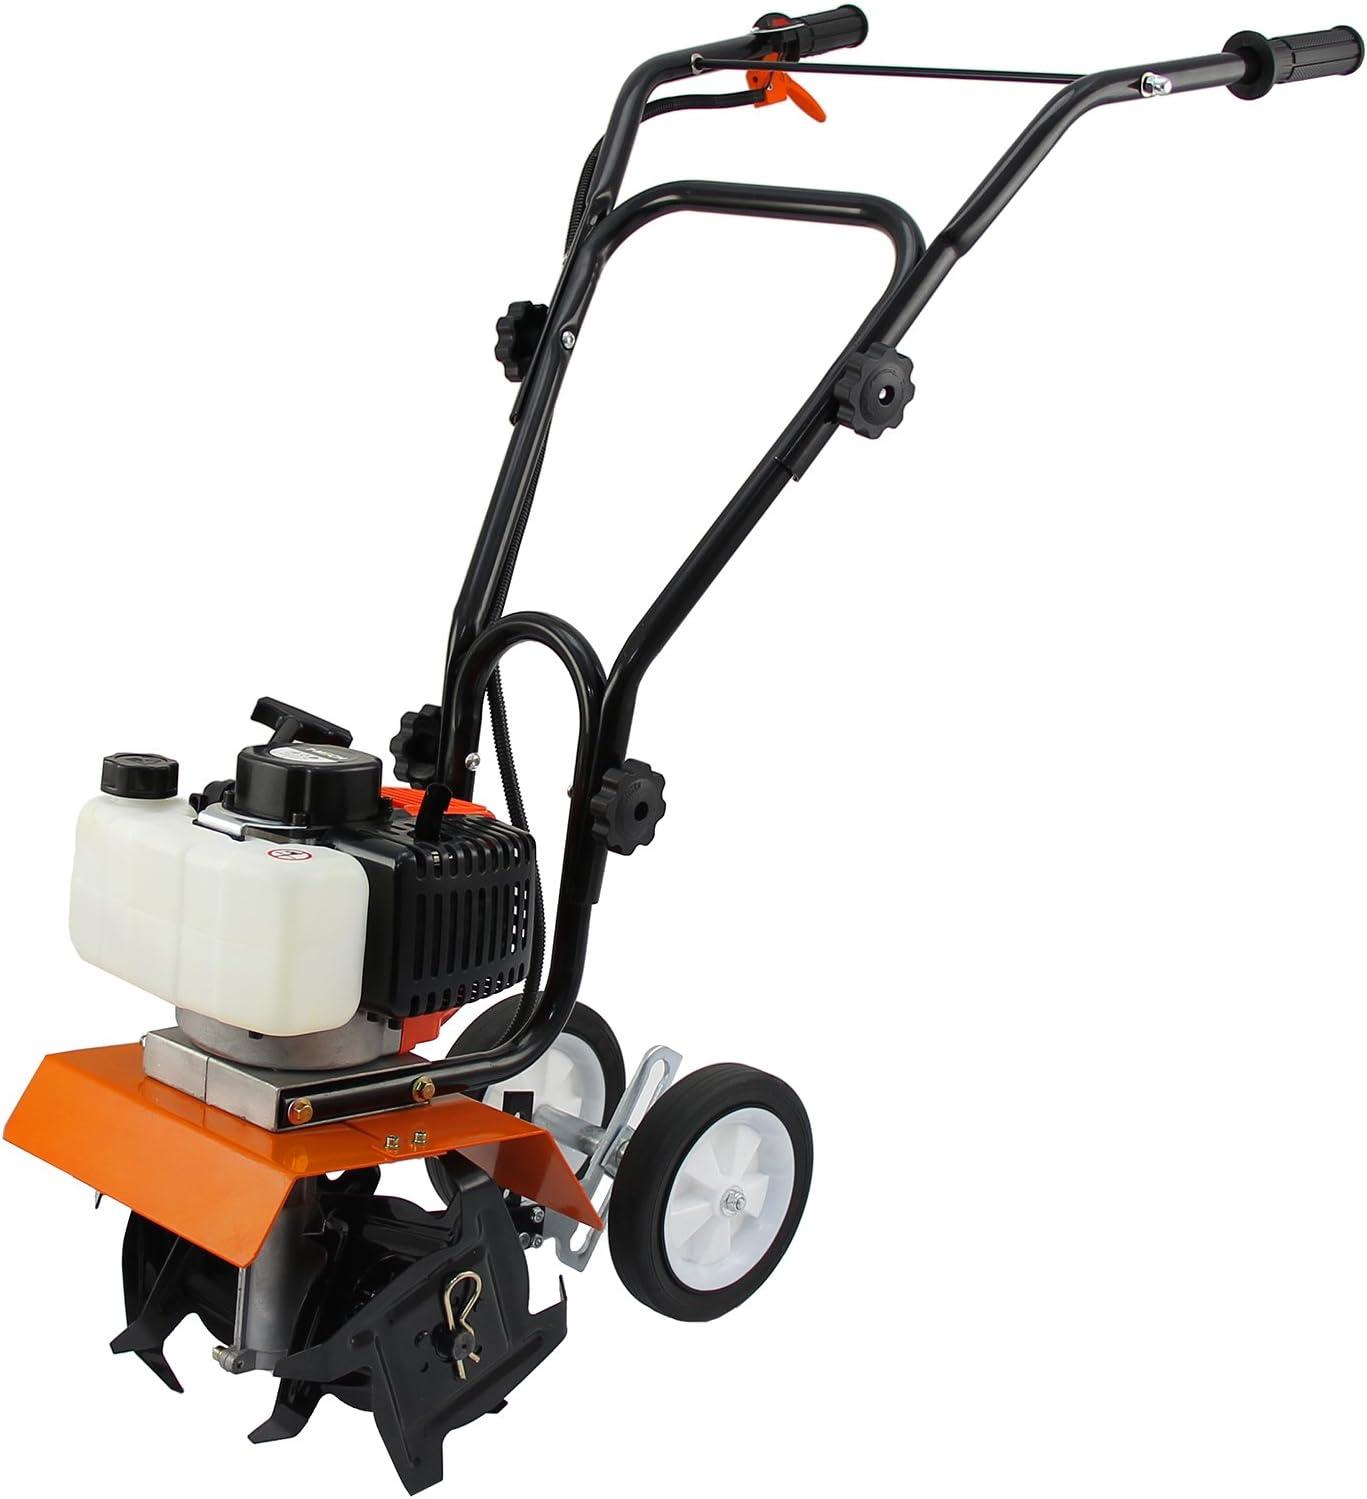 T-Mech Mini caña Motor Cultivador 52cc Gas Gasolina Jardín Rotovator Césped | CE certificación PPE